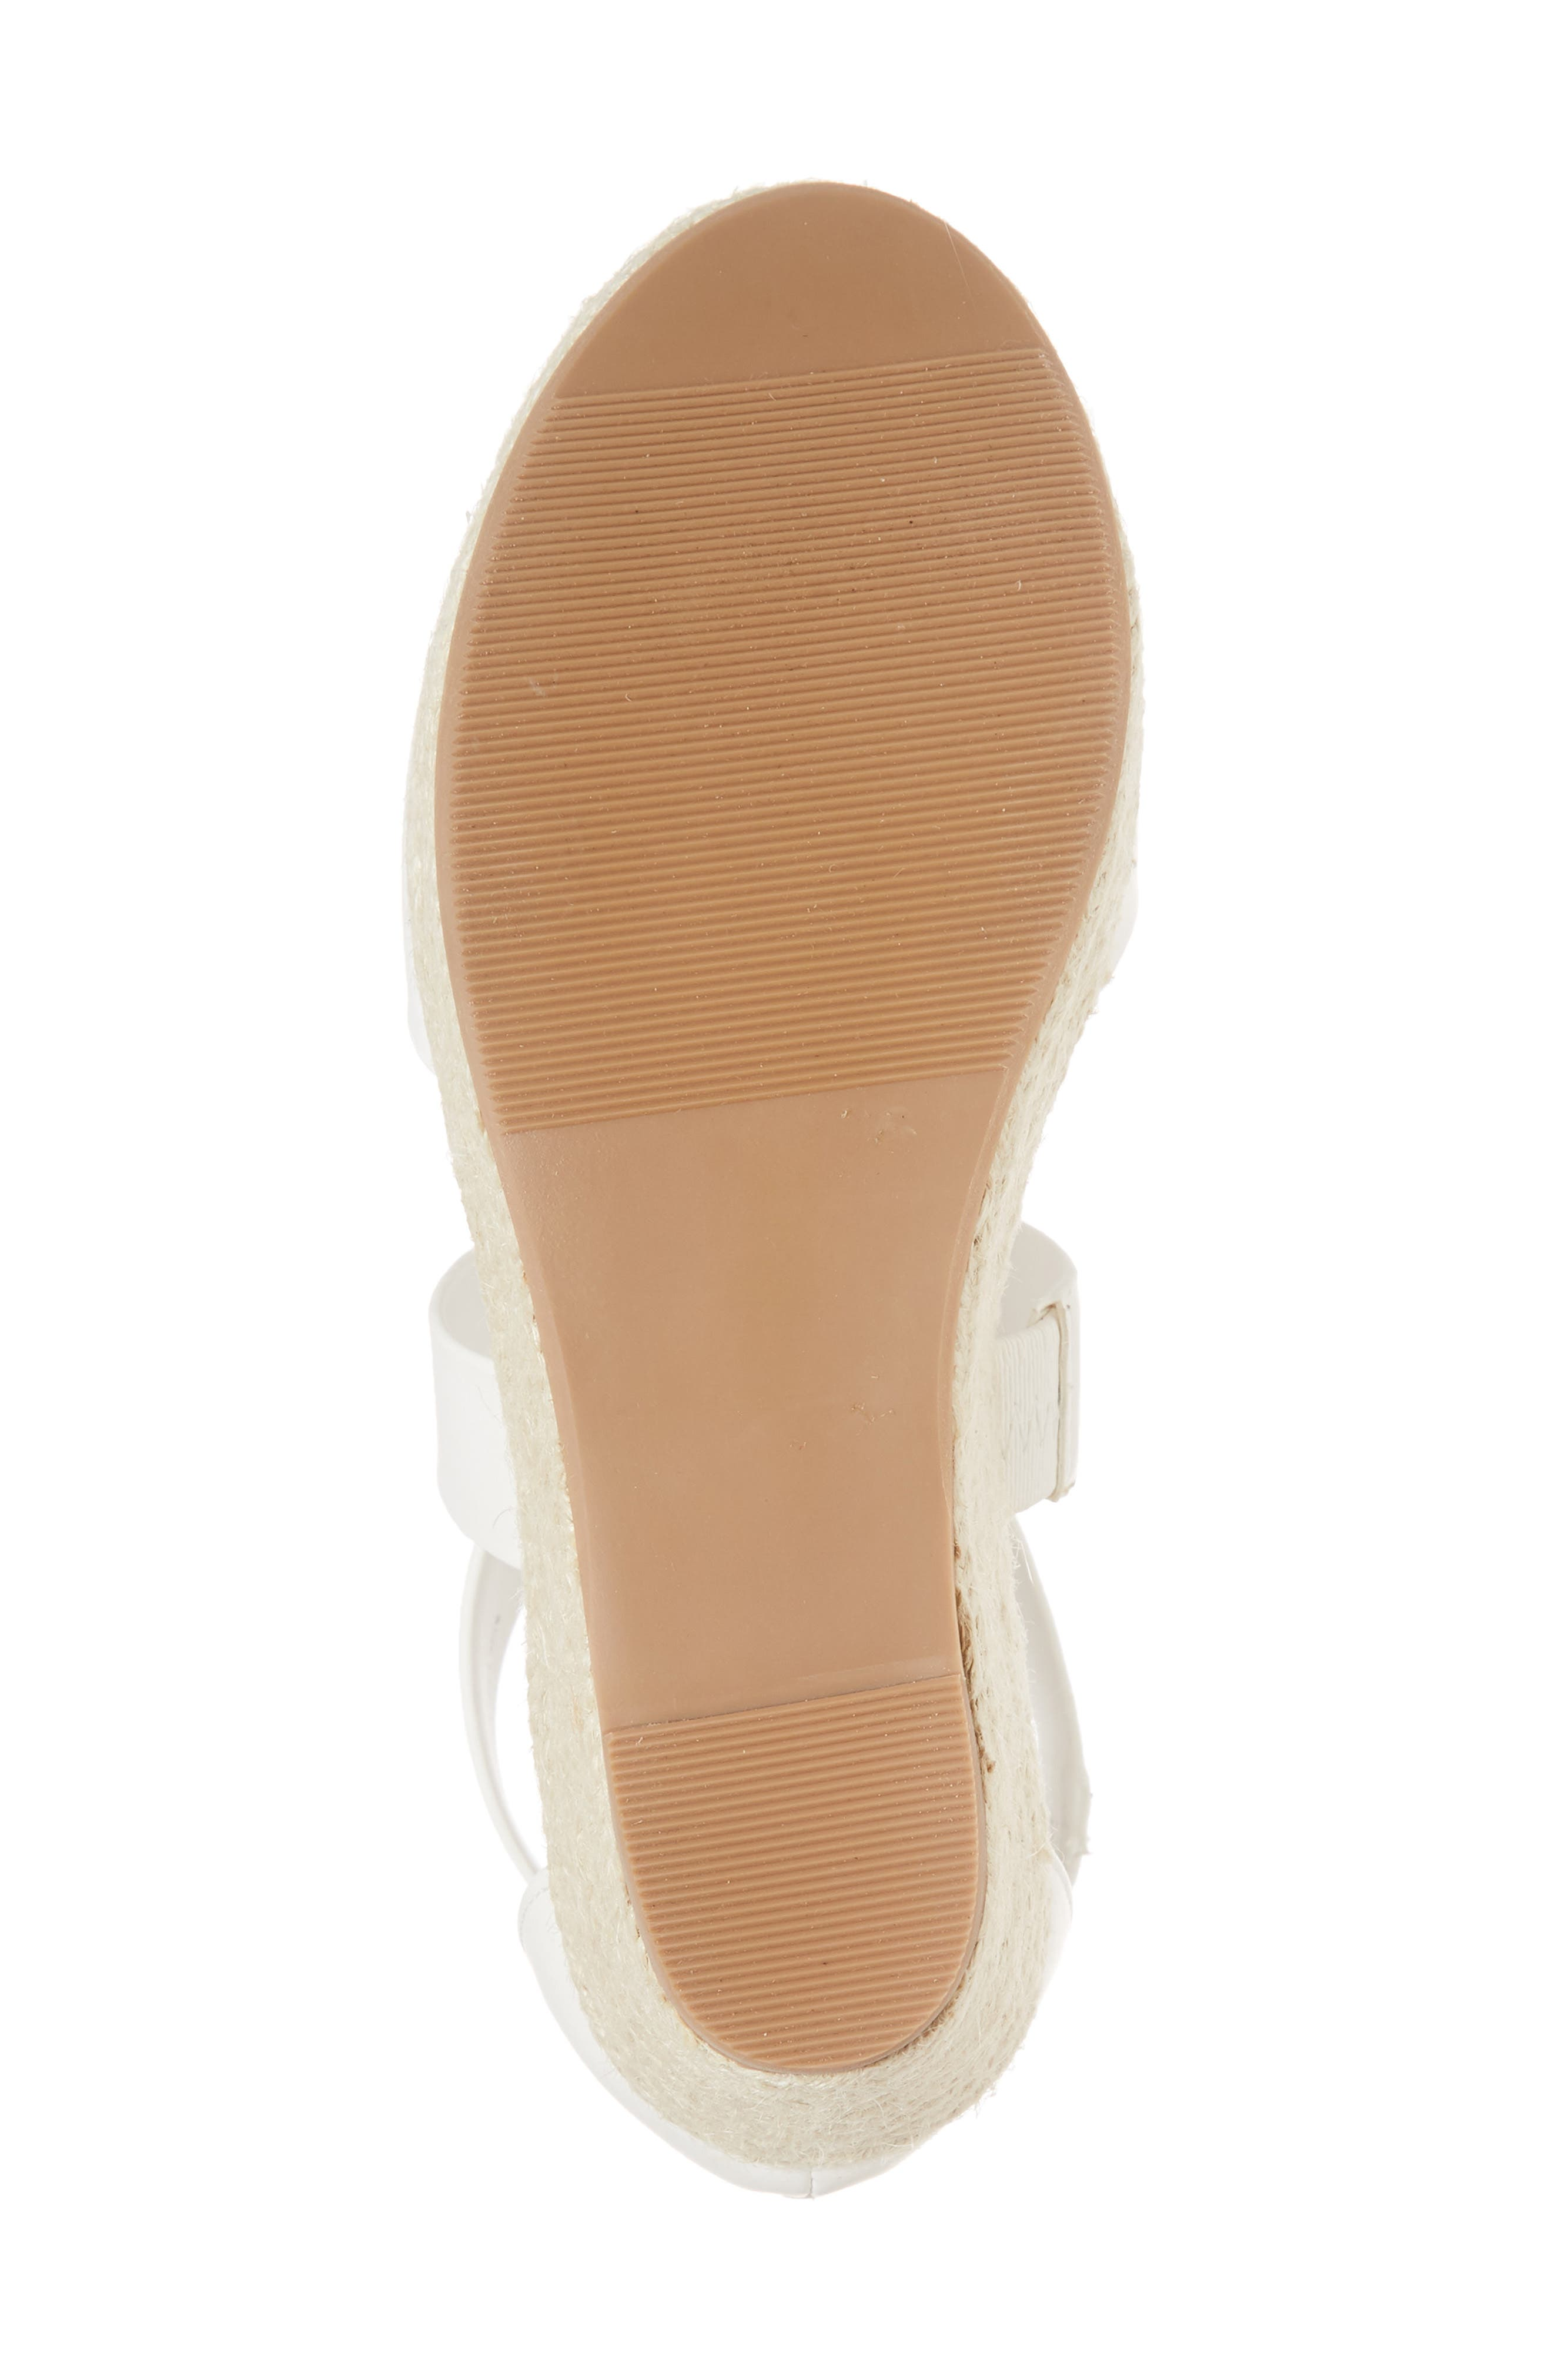 Wilma Platform Wedge Sandal,                             Alternate thumbnail 6, color,                             White